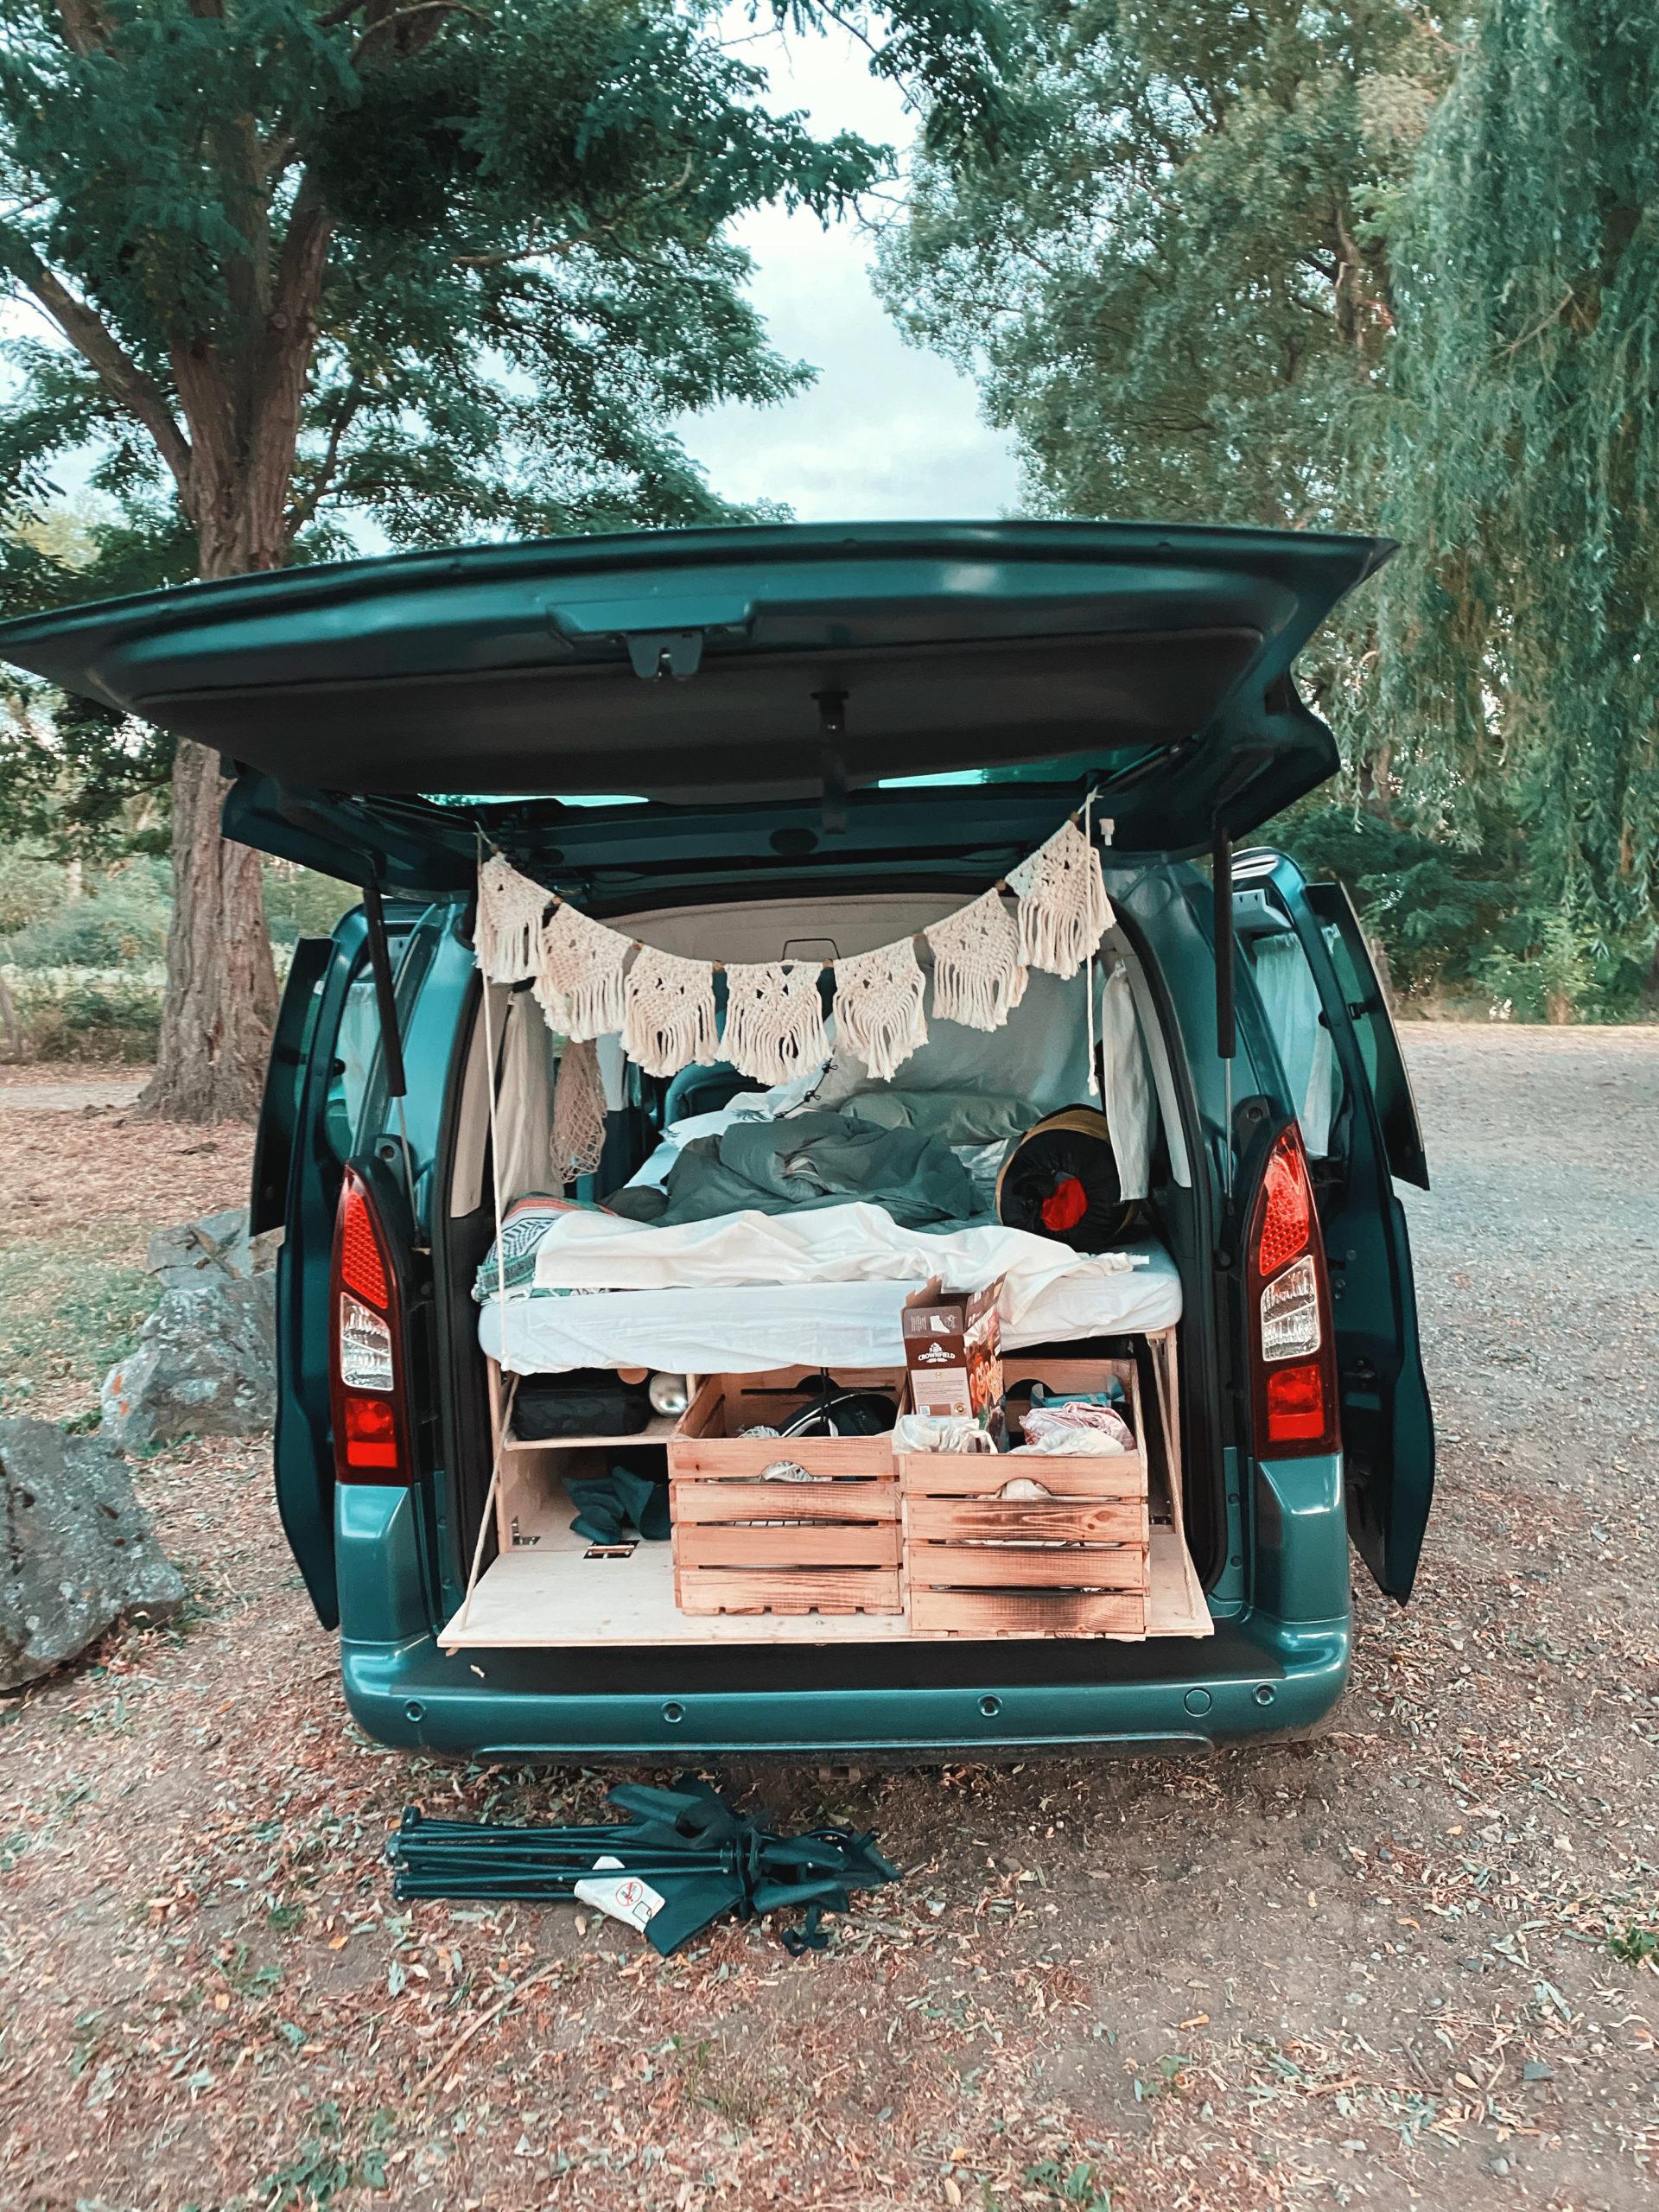 Berlingo Campervan – Vom Familienauto zum Miniwohnmobil